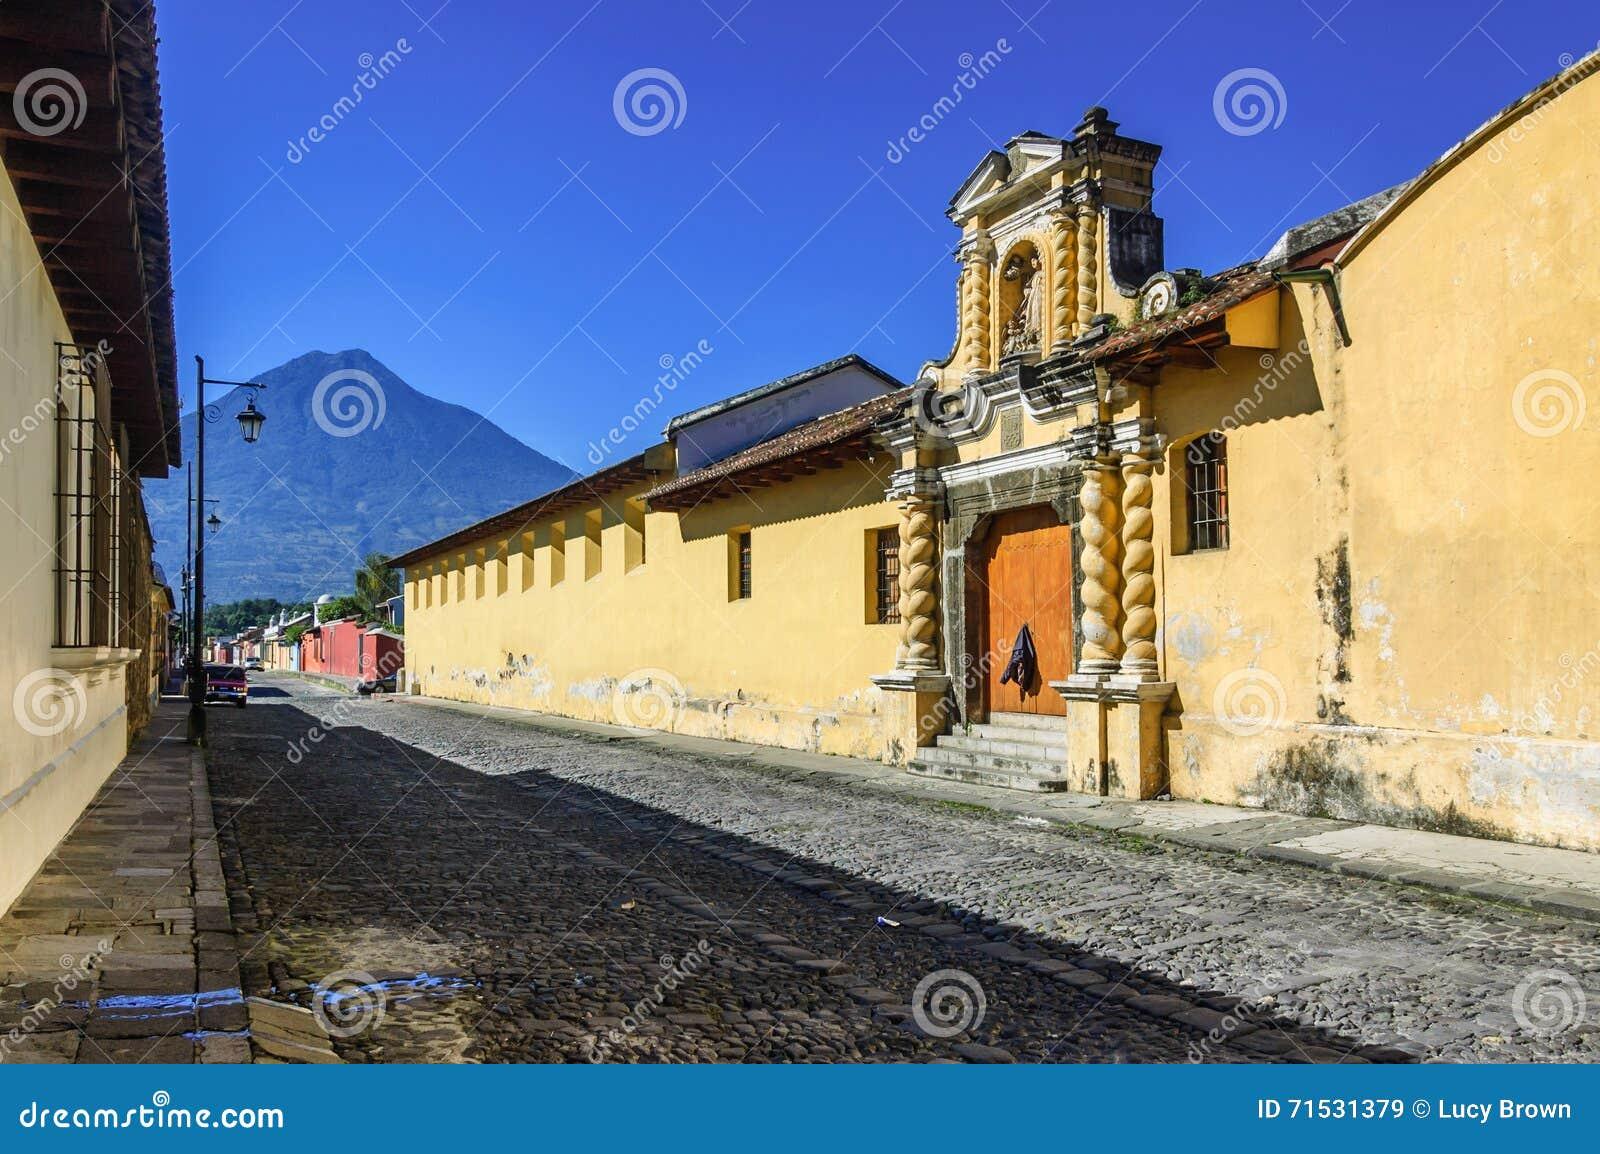 Aguavulkaan & keistraat, Antigua, Guatemala